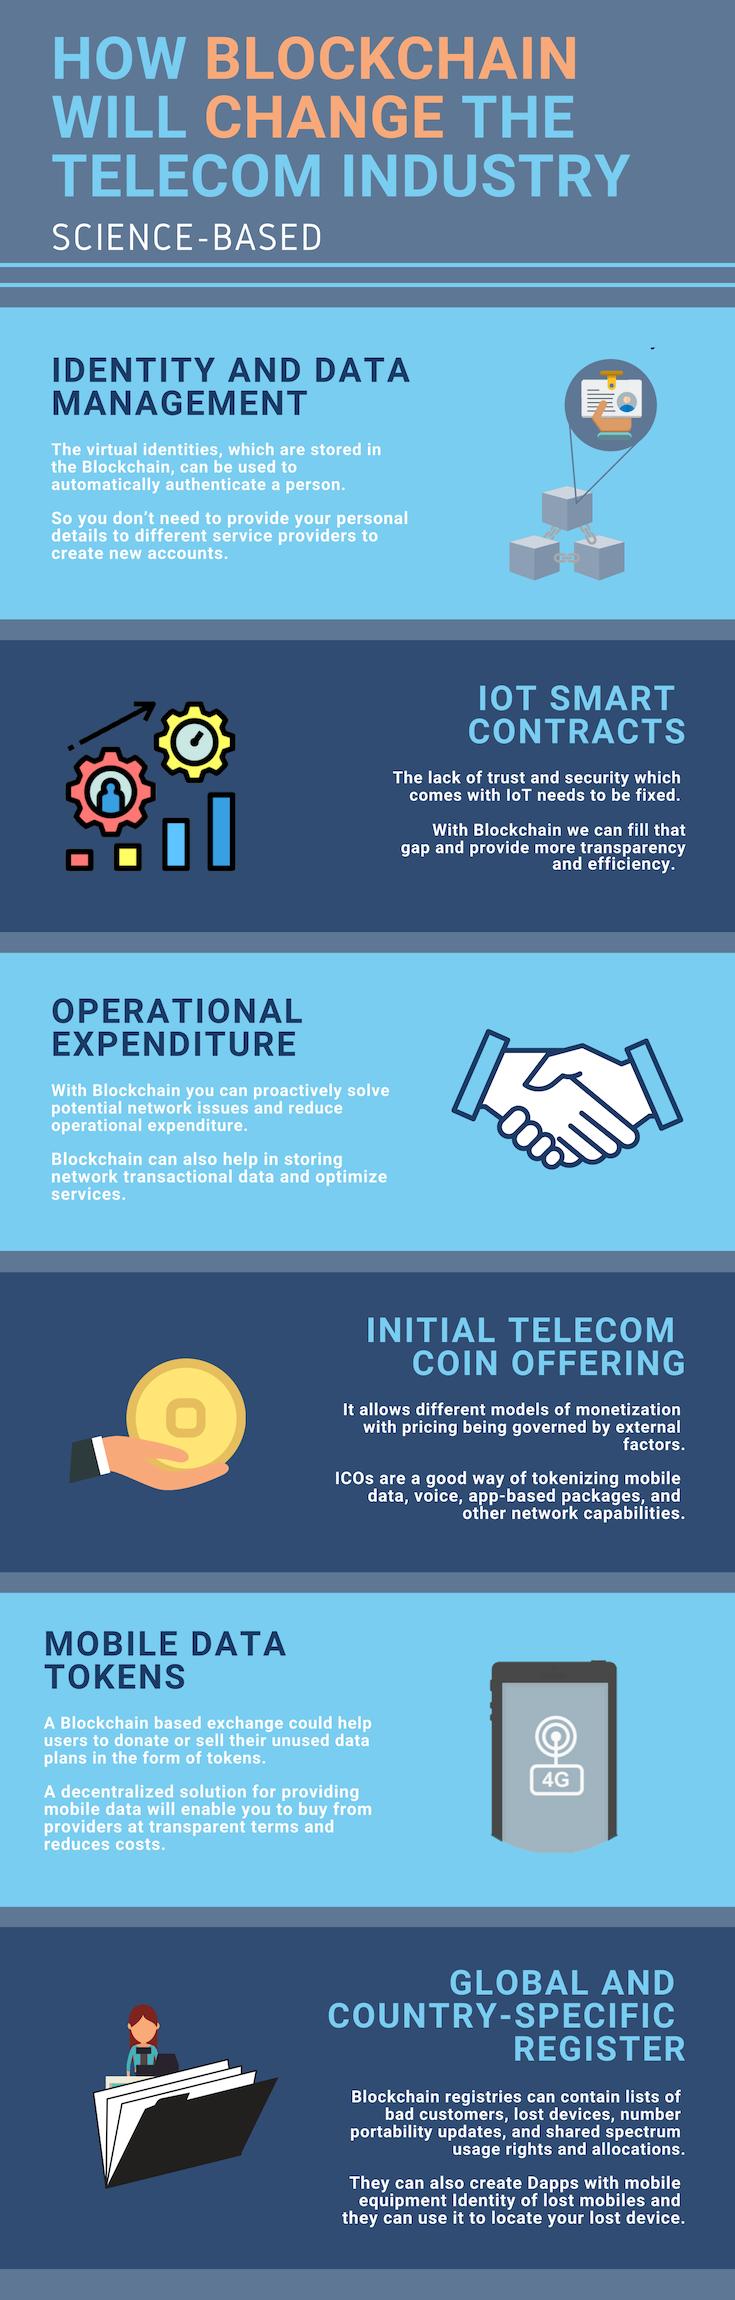 The Best 6 Blockchain Telecom Use Cases Amazing Business Ideas Blockchain Blockchain Technology Use Case